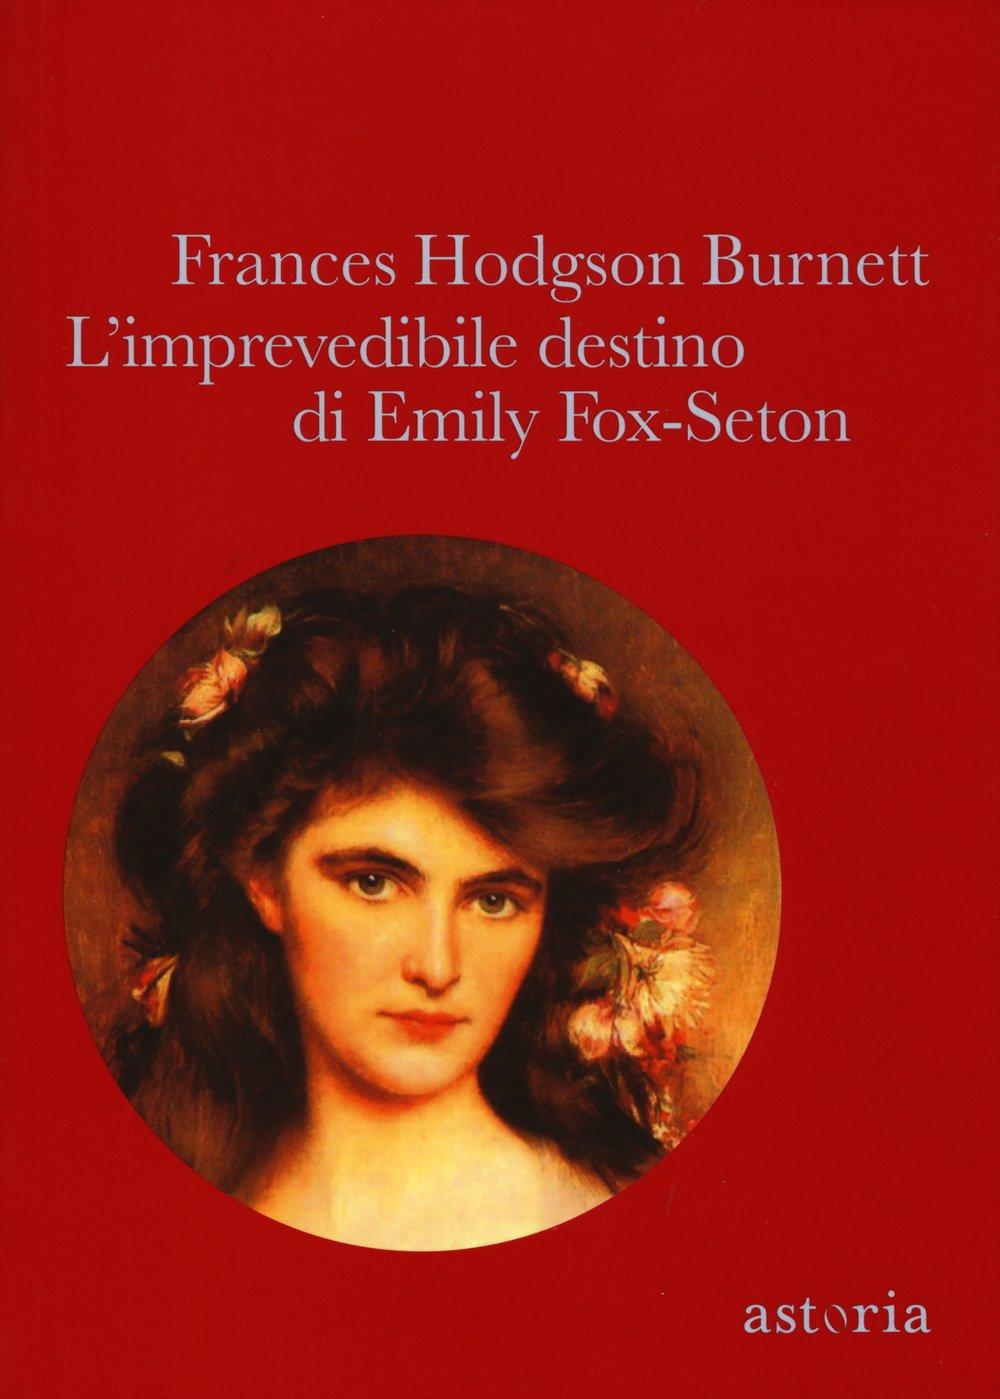 L'imprevedibile destino di Emily Fox-Seton